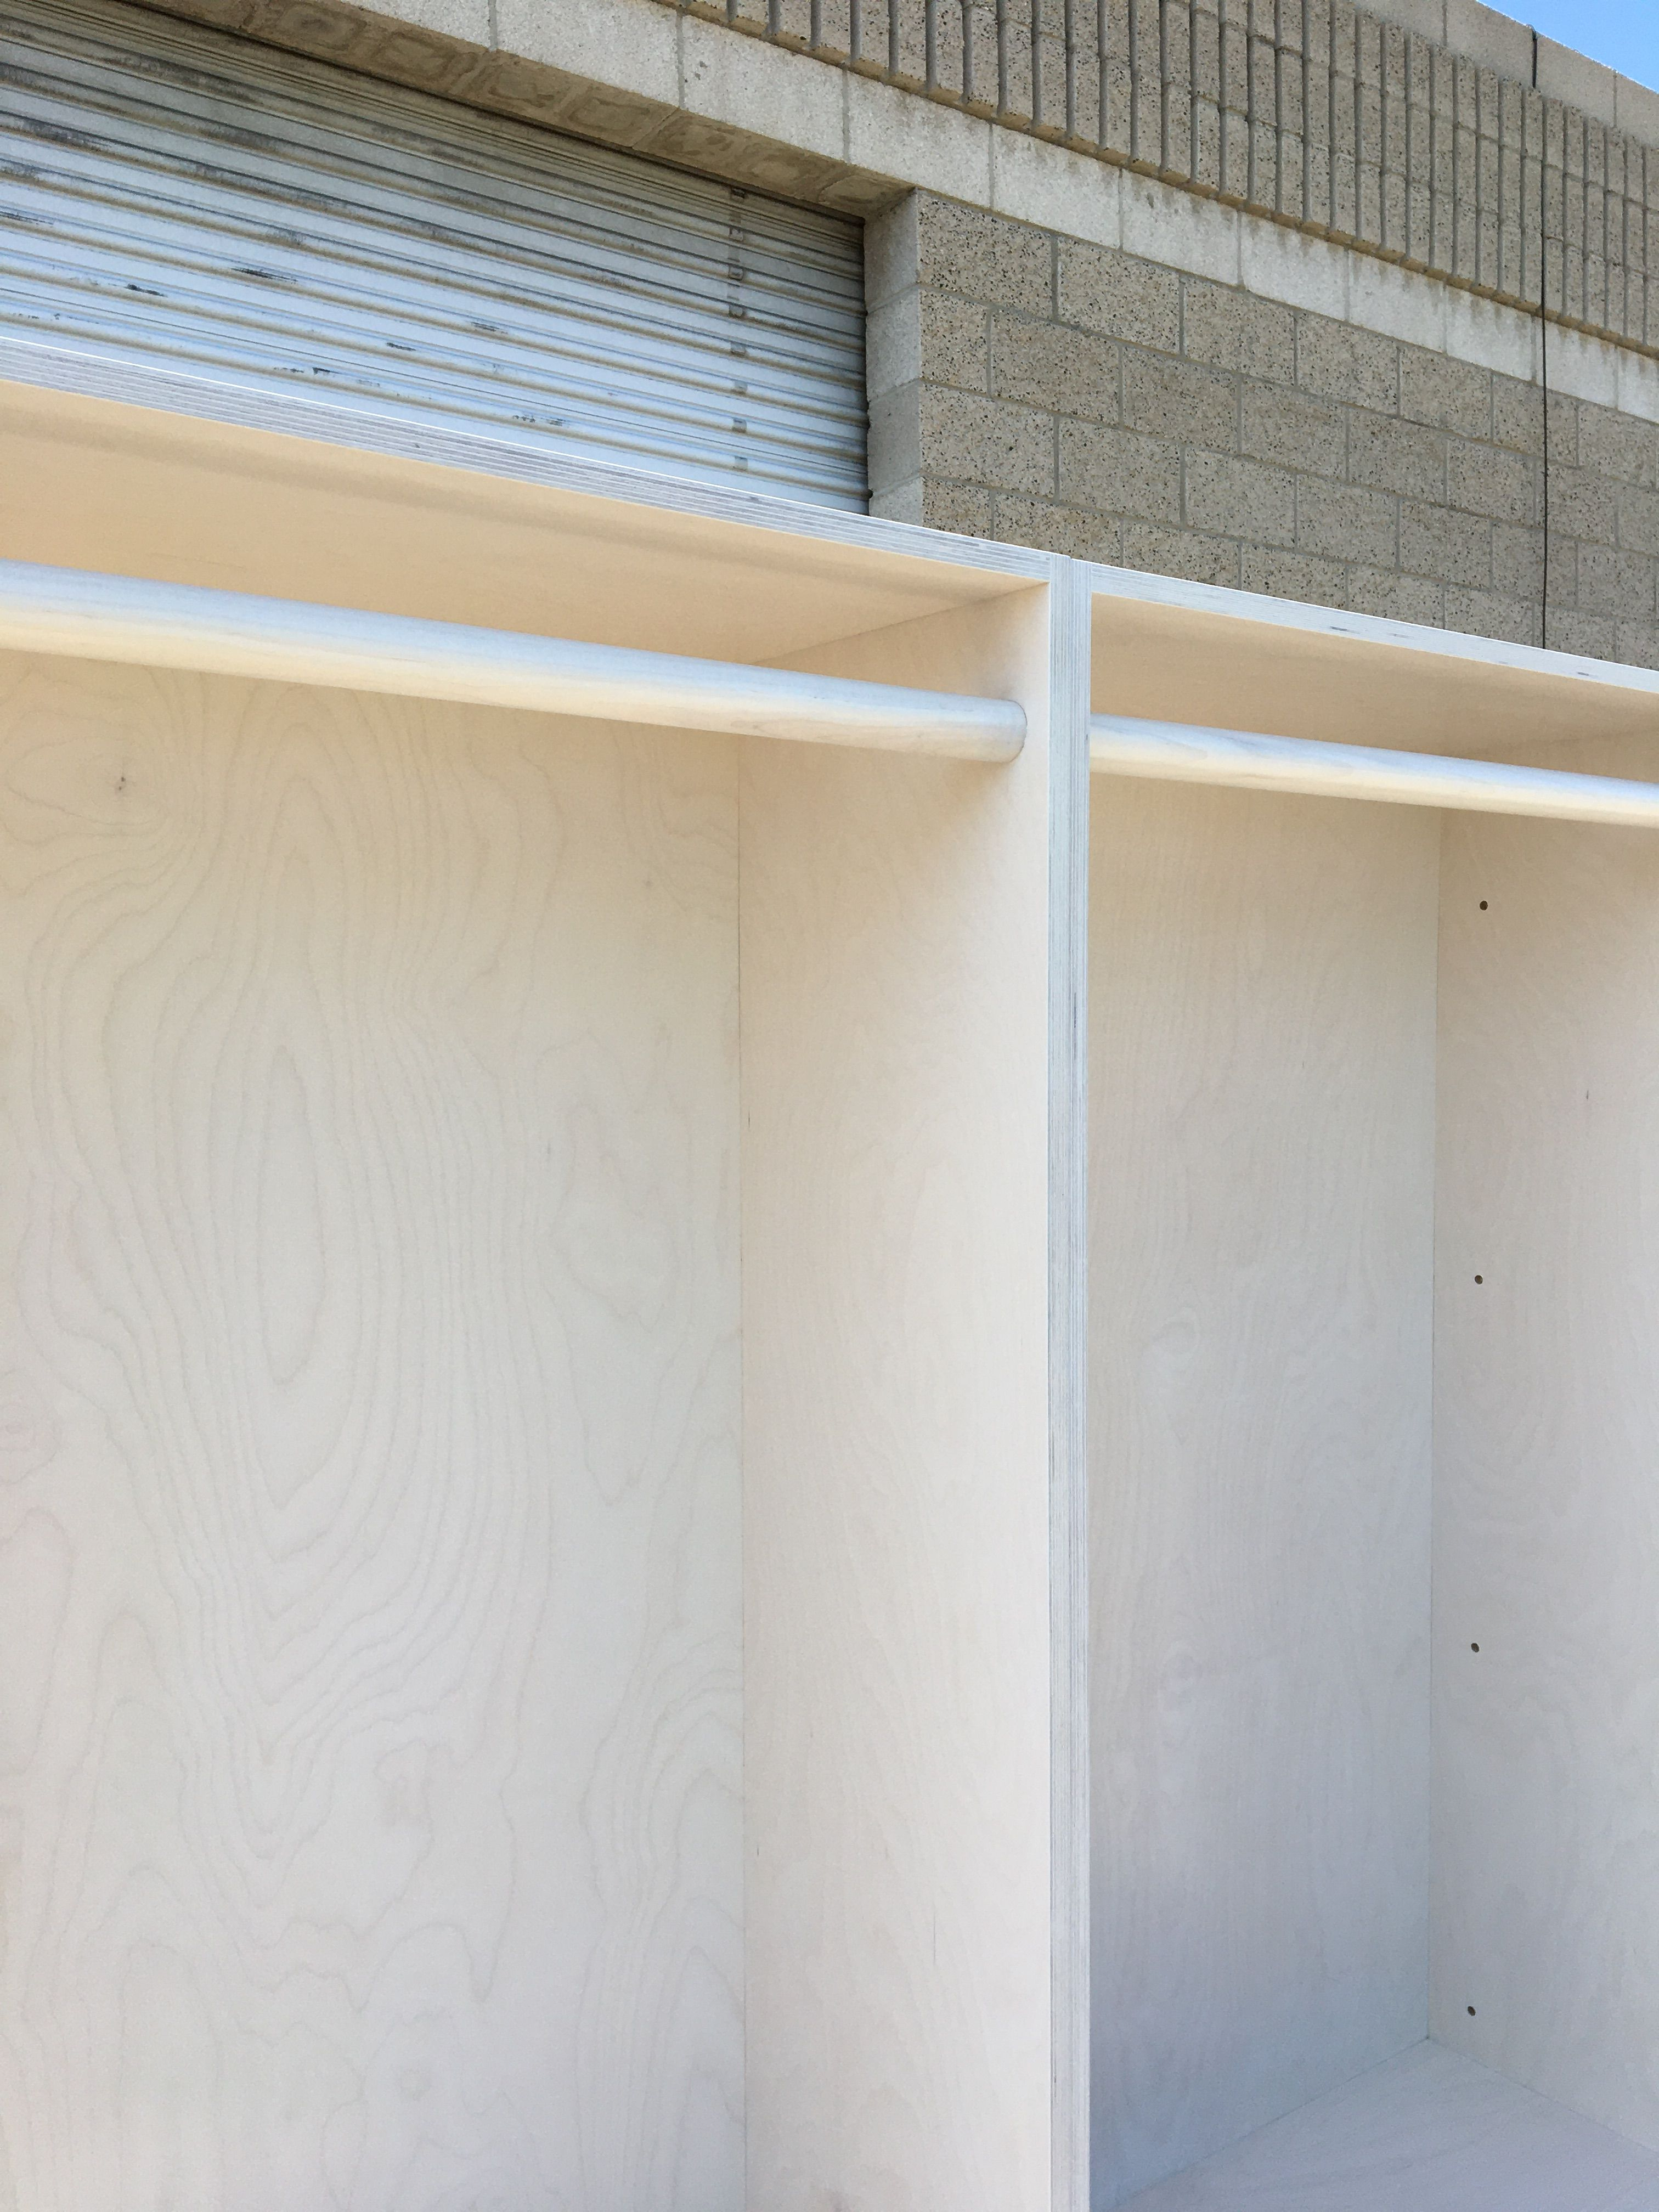 Three Section Closet product image 4